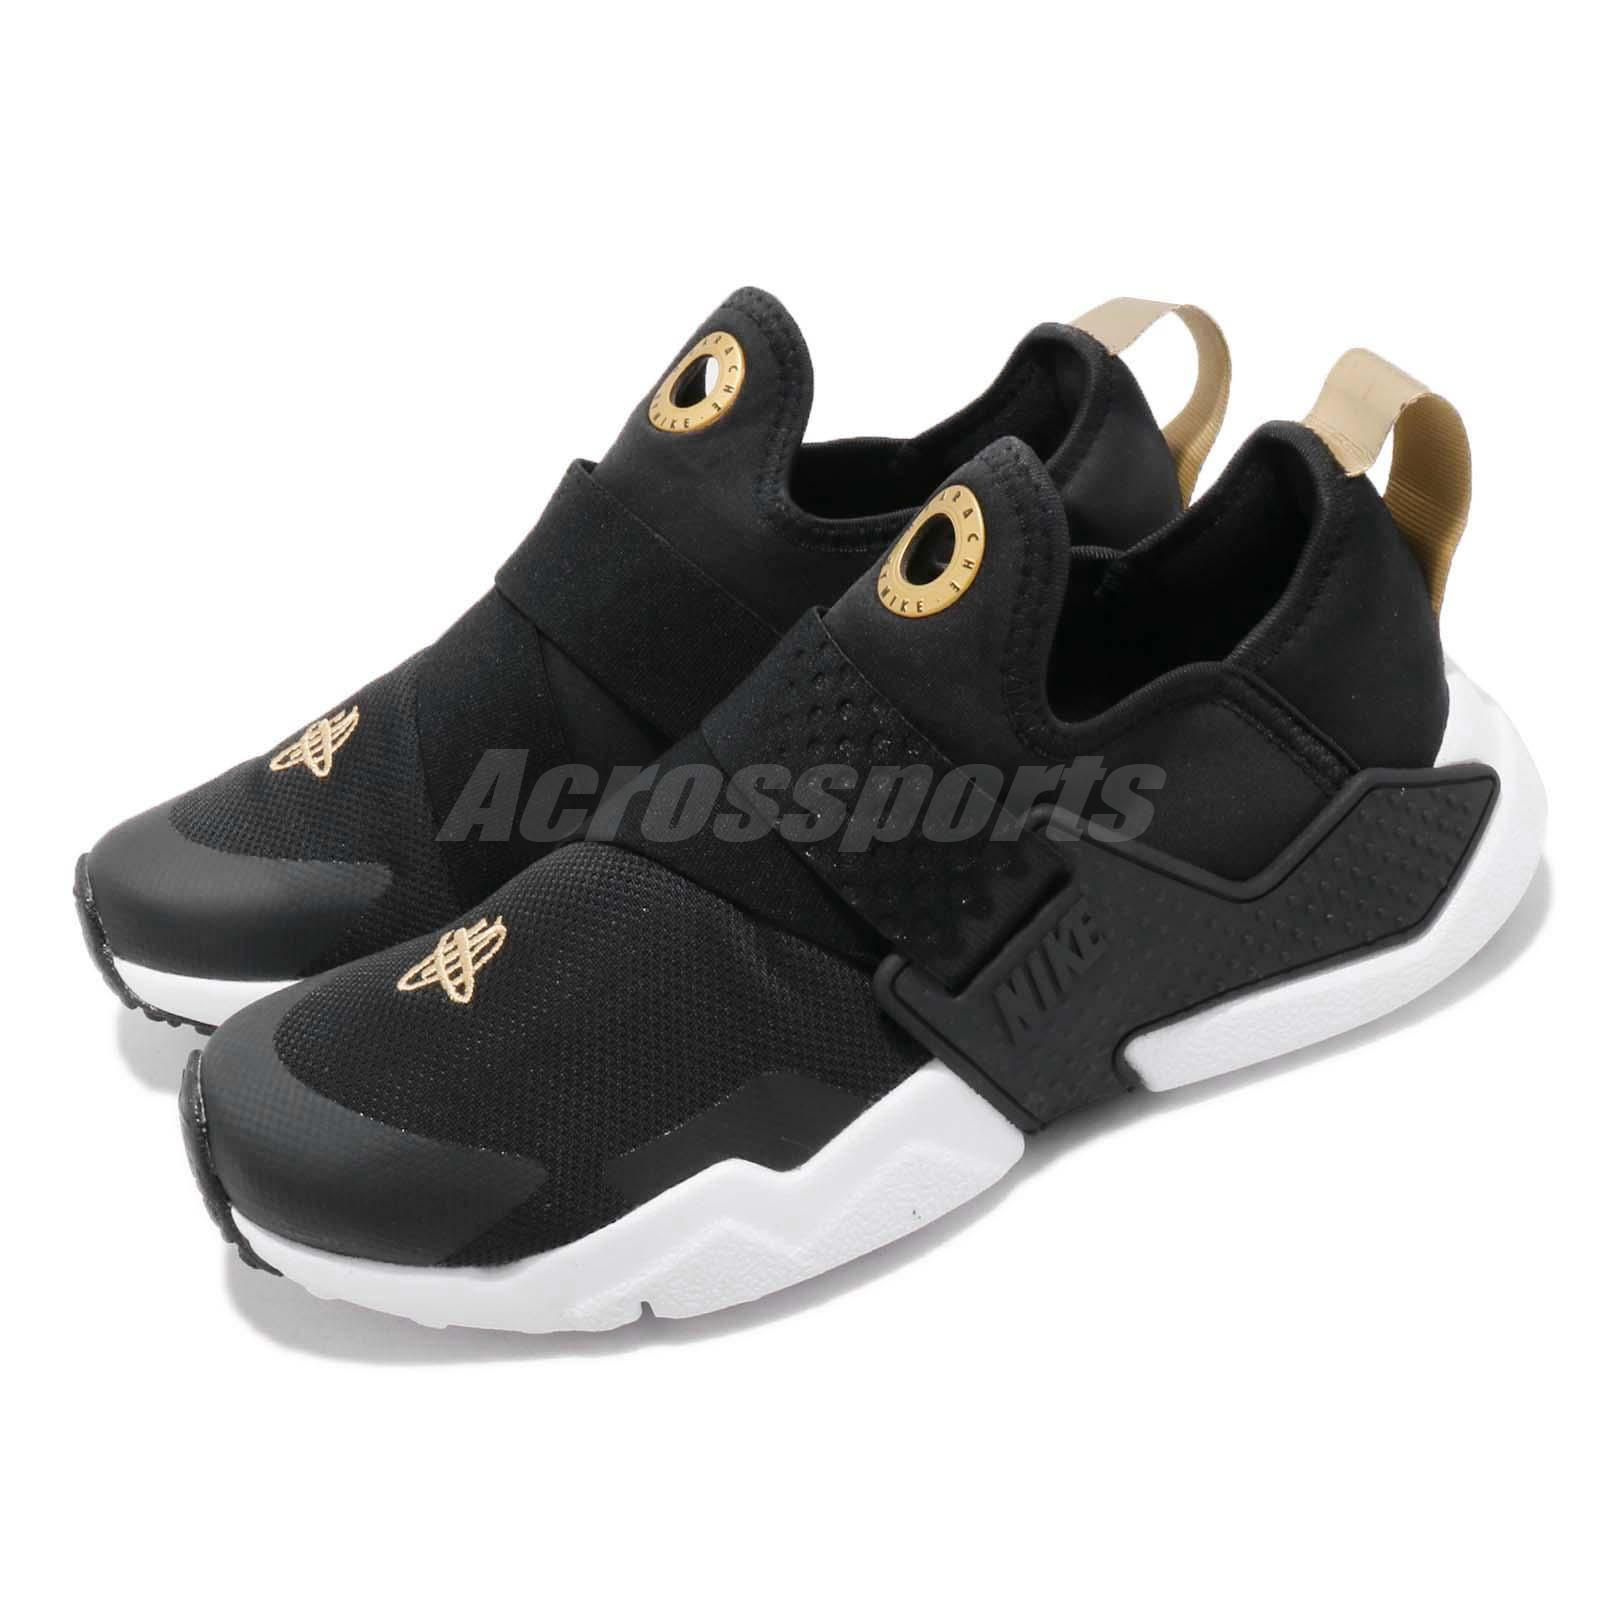 Nike Huarache Extreme GS nero bianca oro Kid Youth donna Slip On AQ0575-007